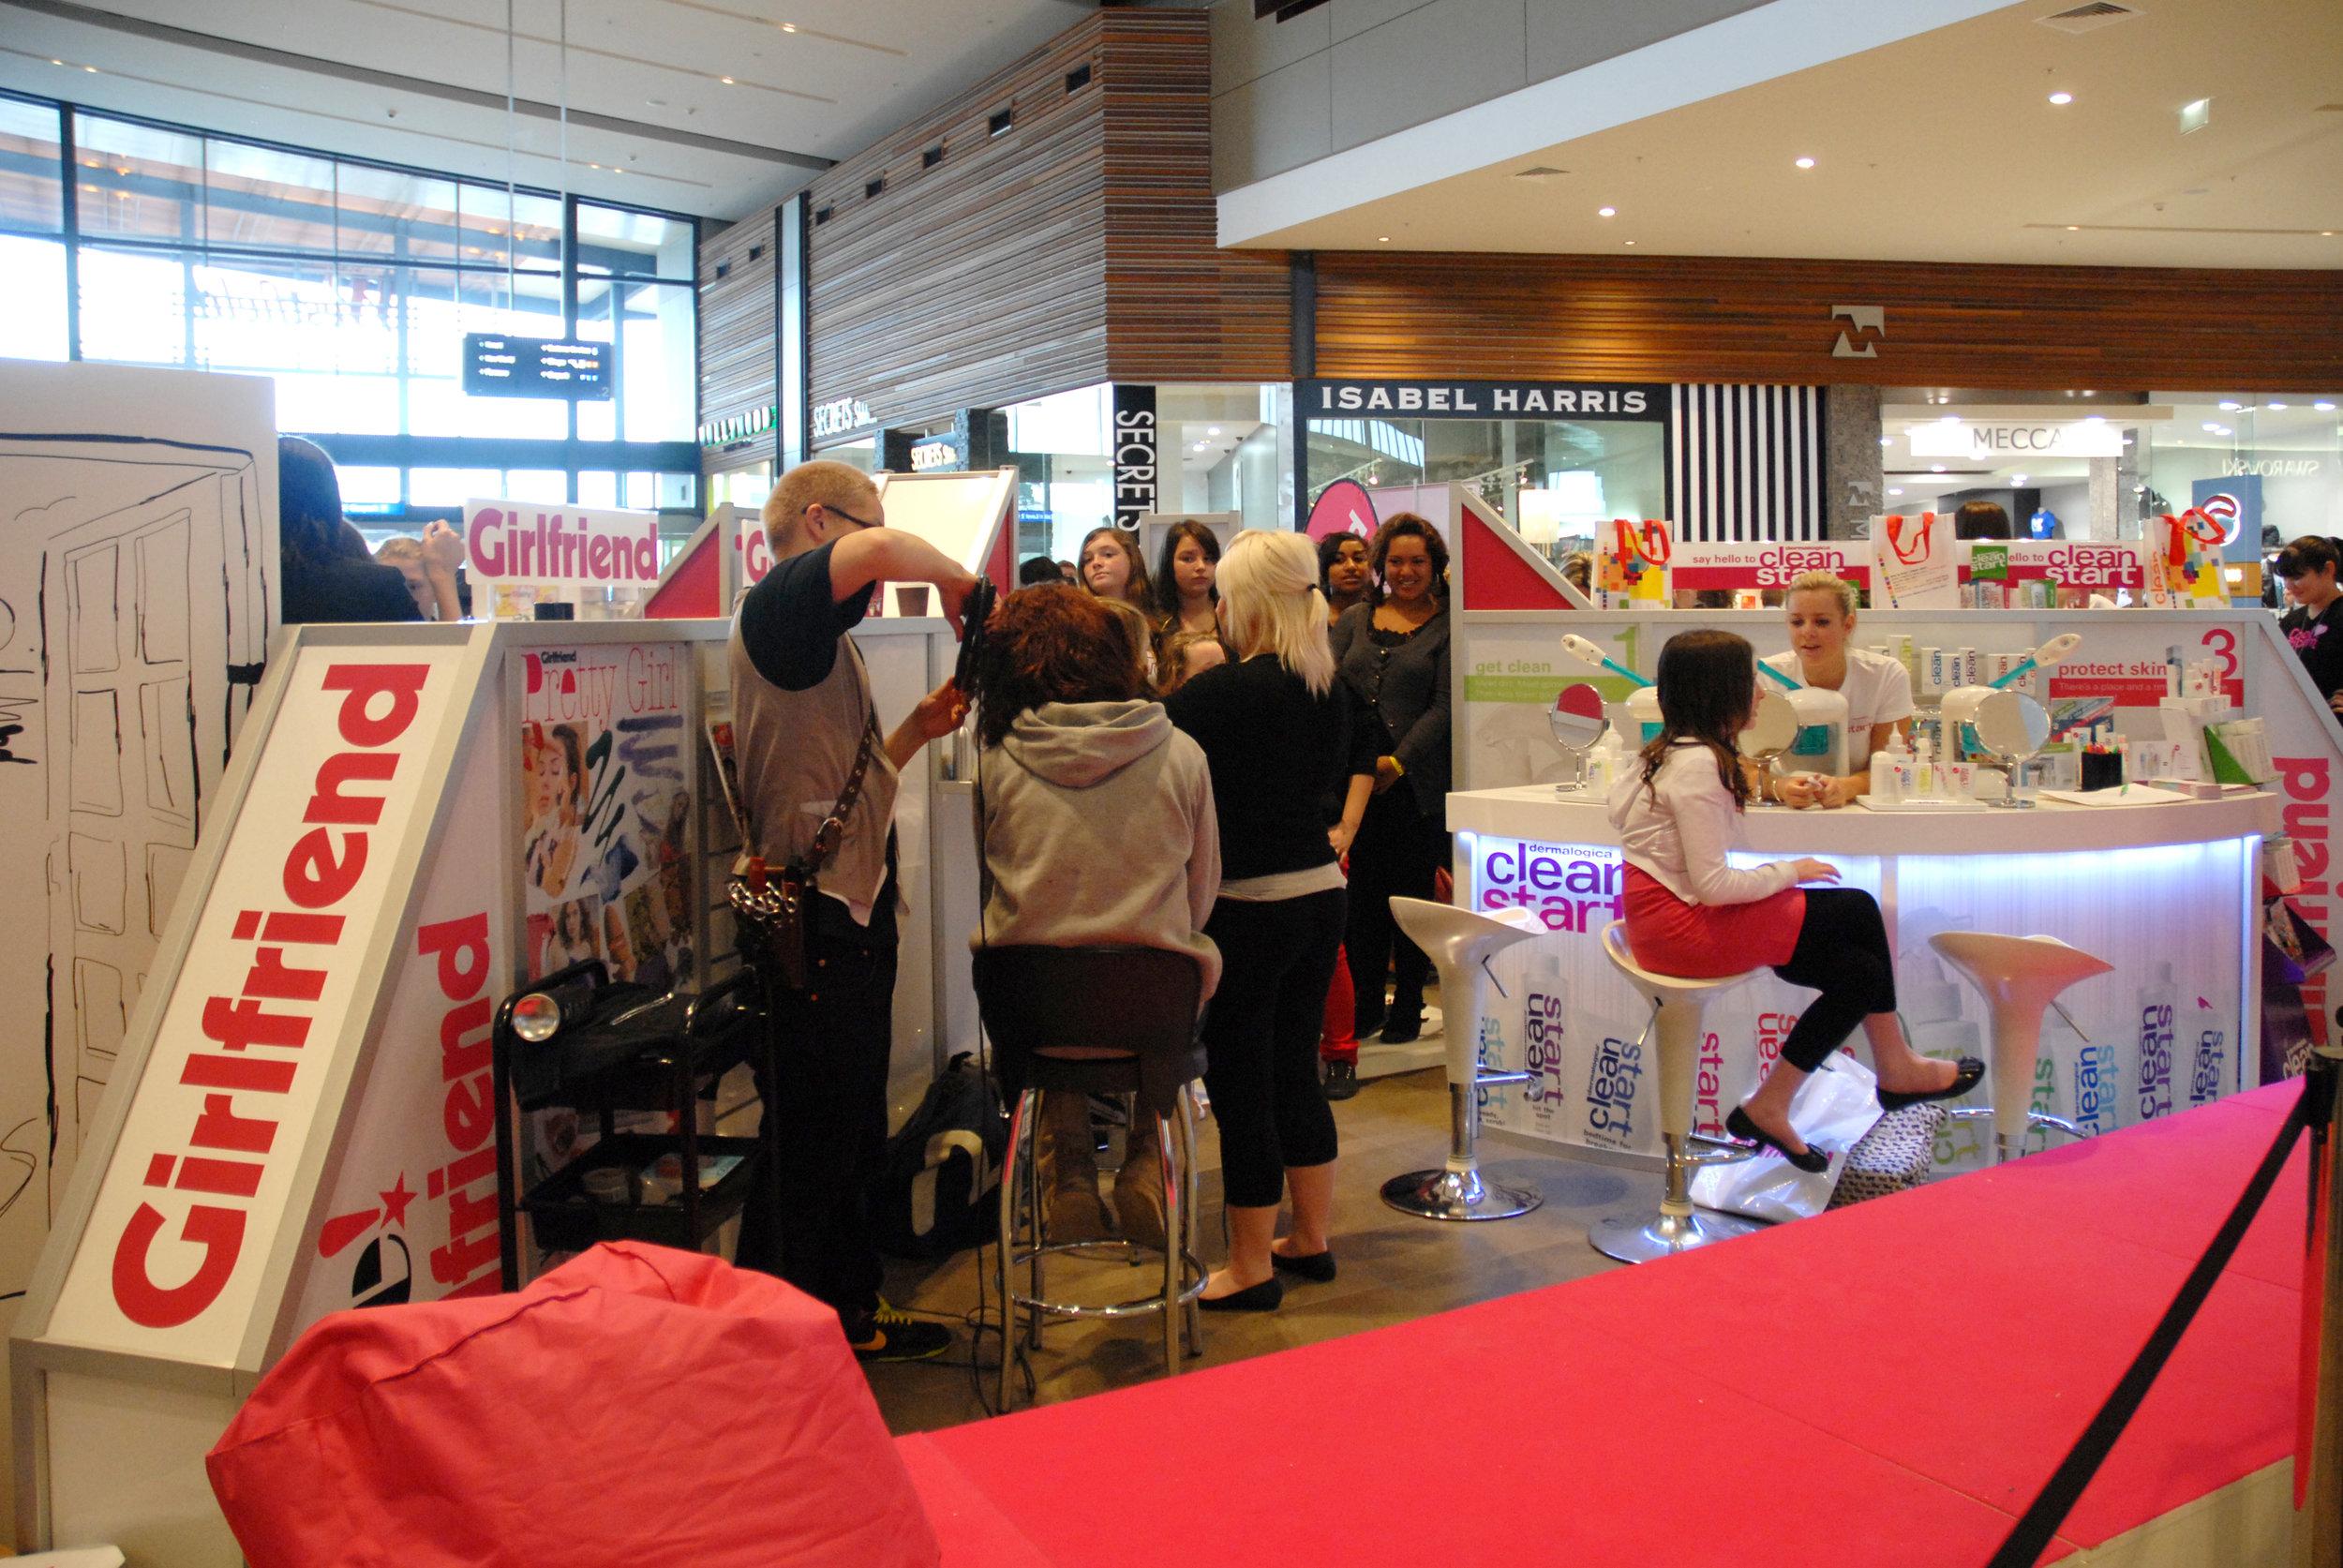 Girlfriend Mall Activation